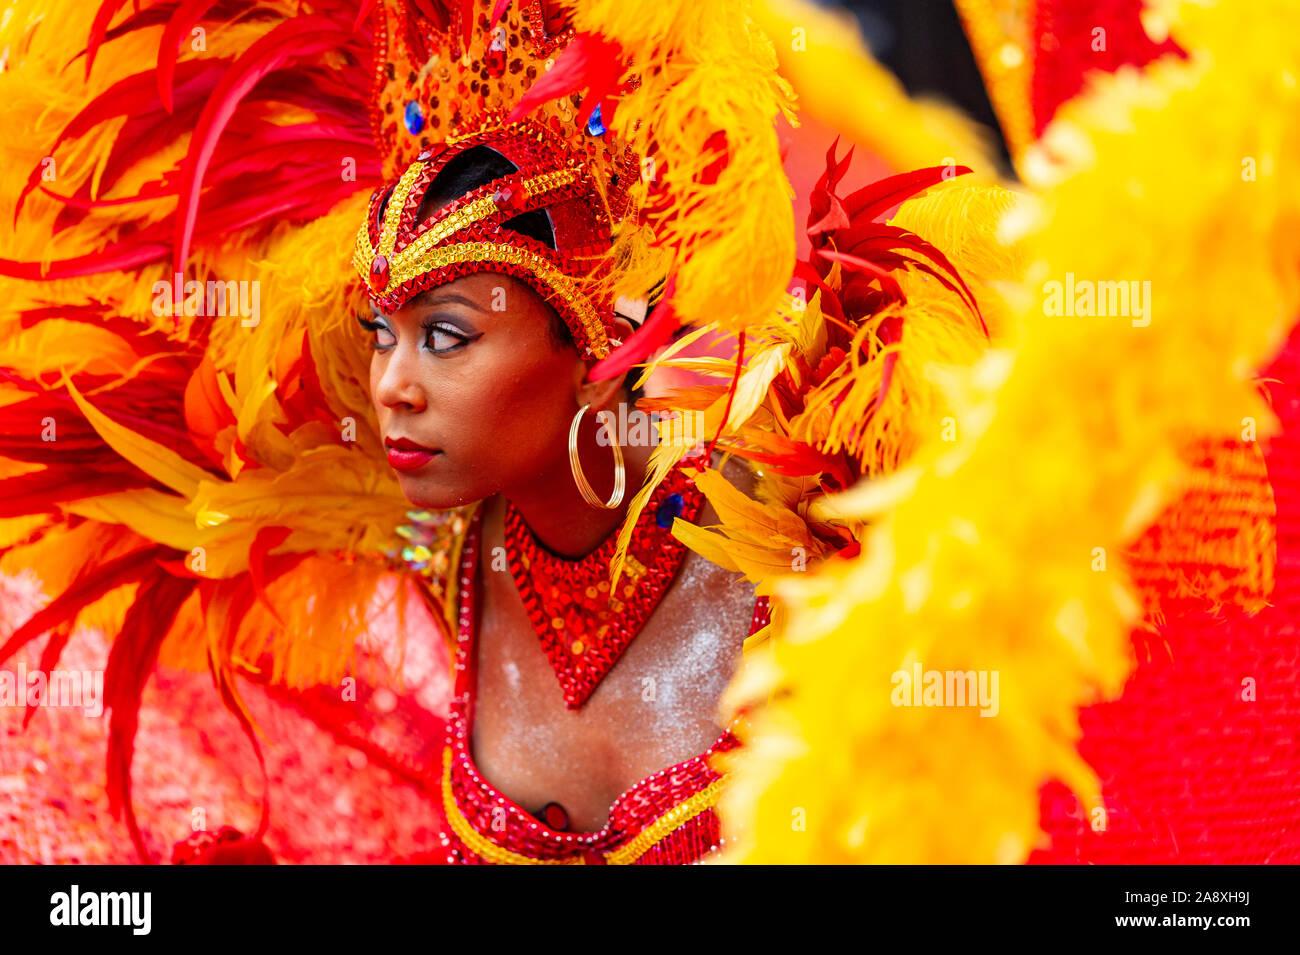 a-caribbean-parade-participant-at-carifest-festival-calgary-alberta-canada-2A8XH9J.jpg